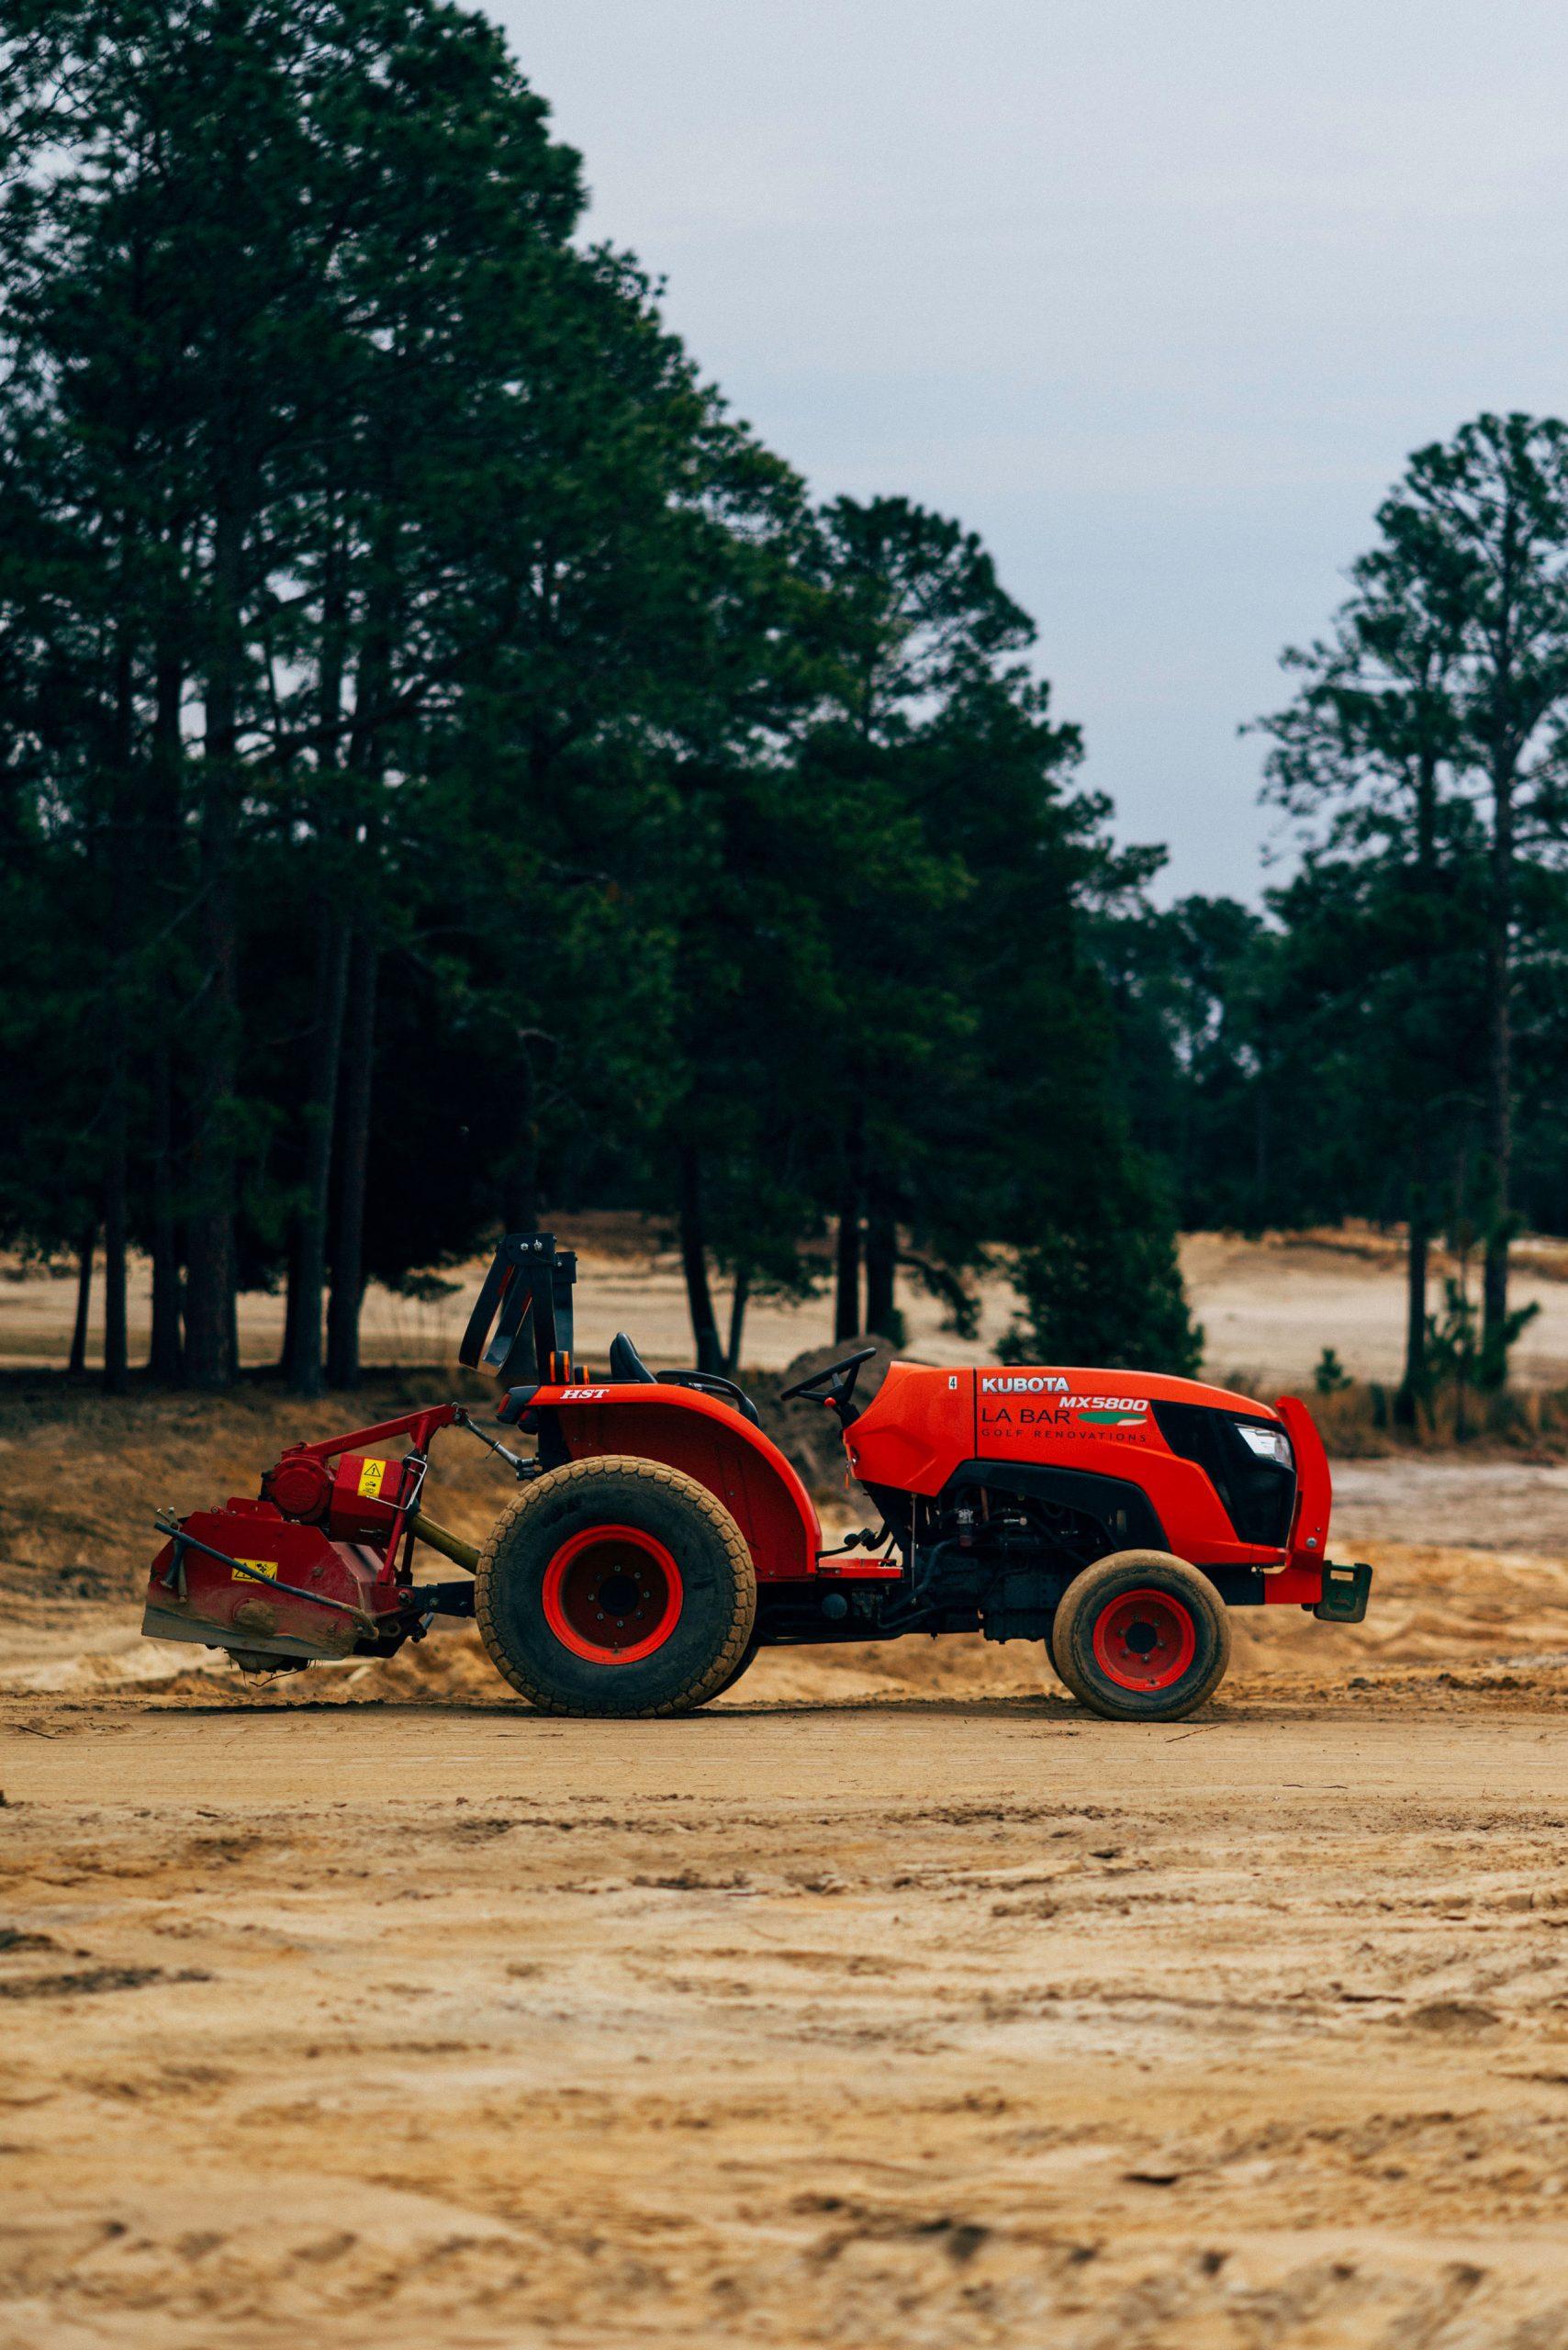 Bulldozer. Photo by Christian Hafer.